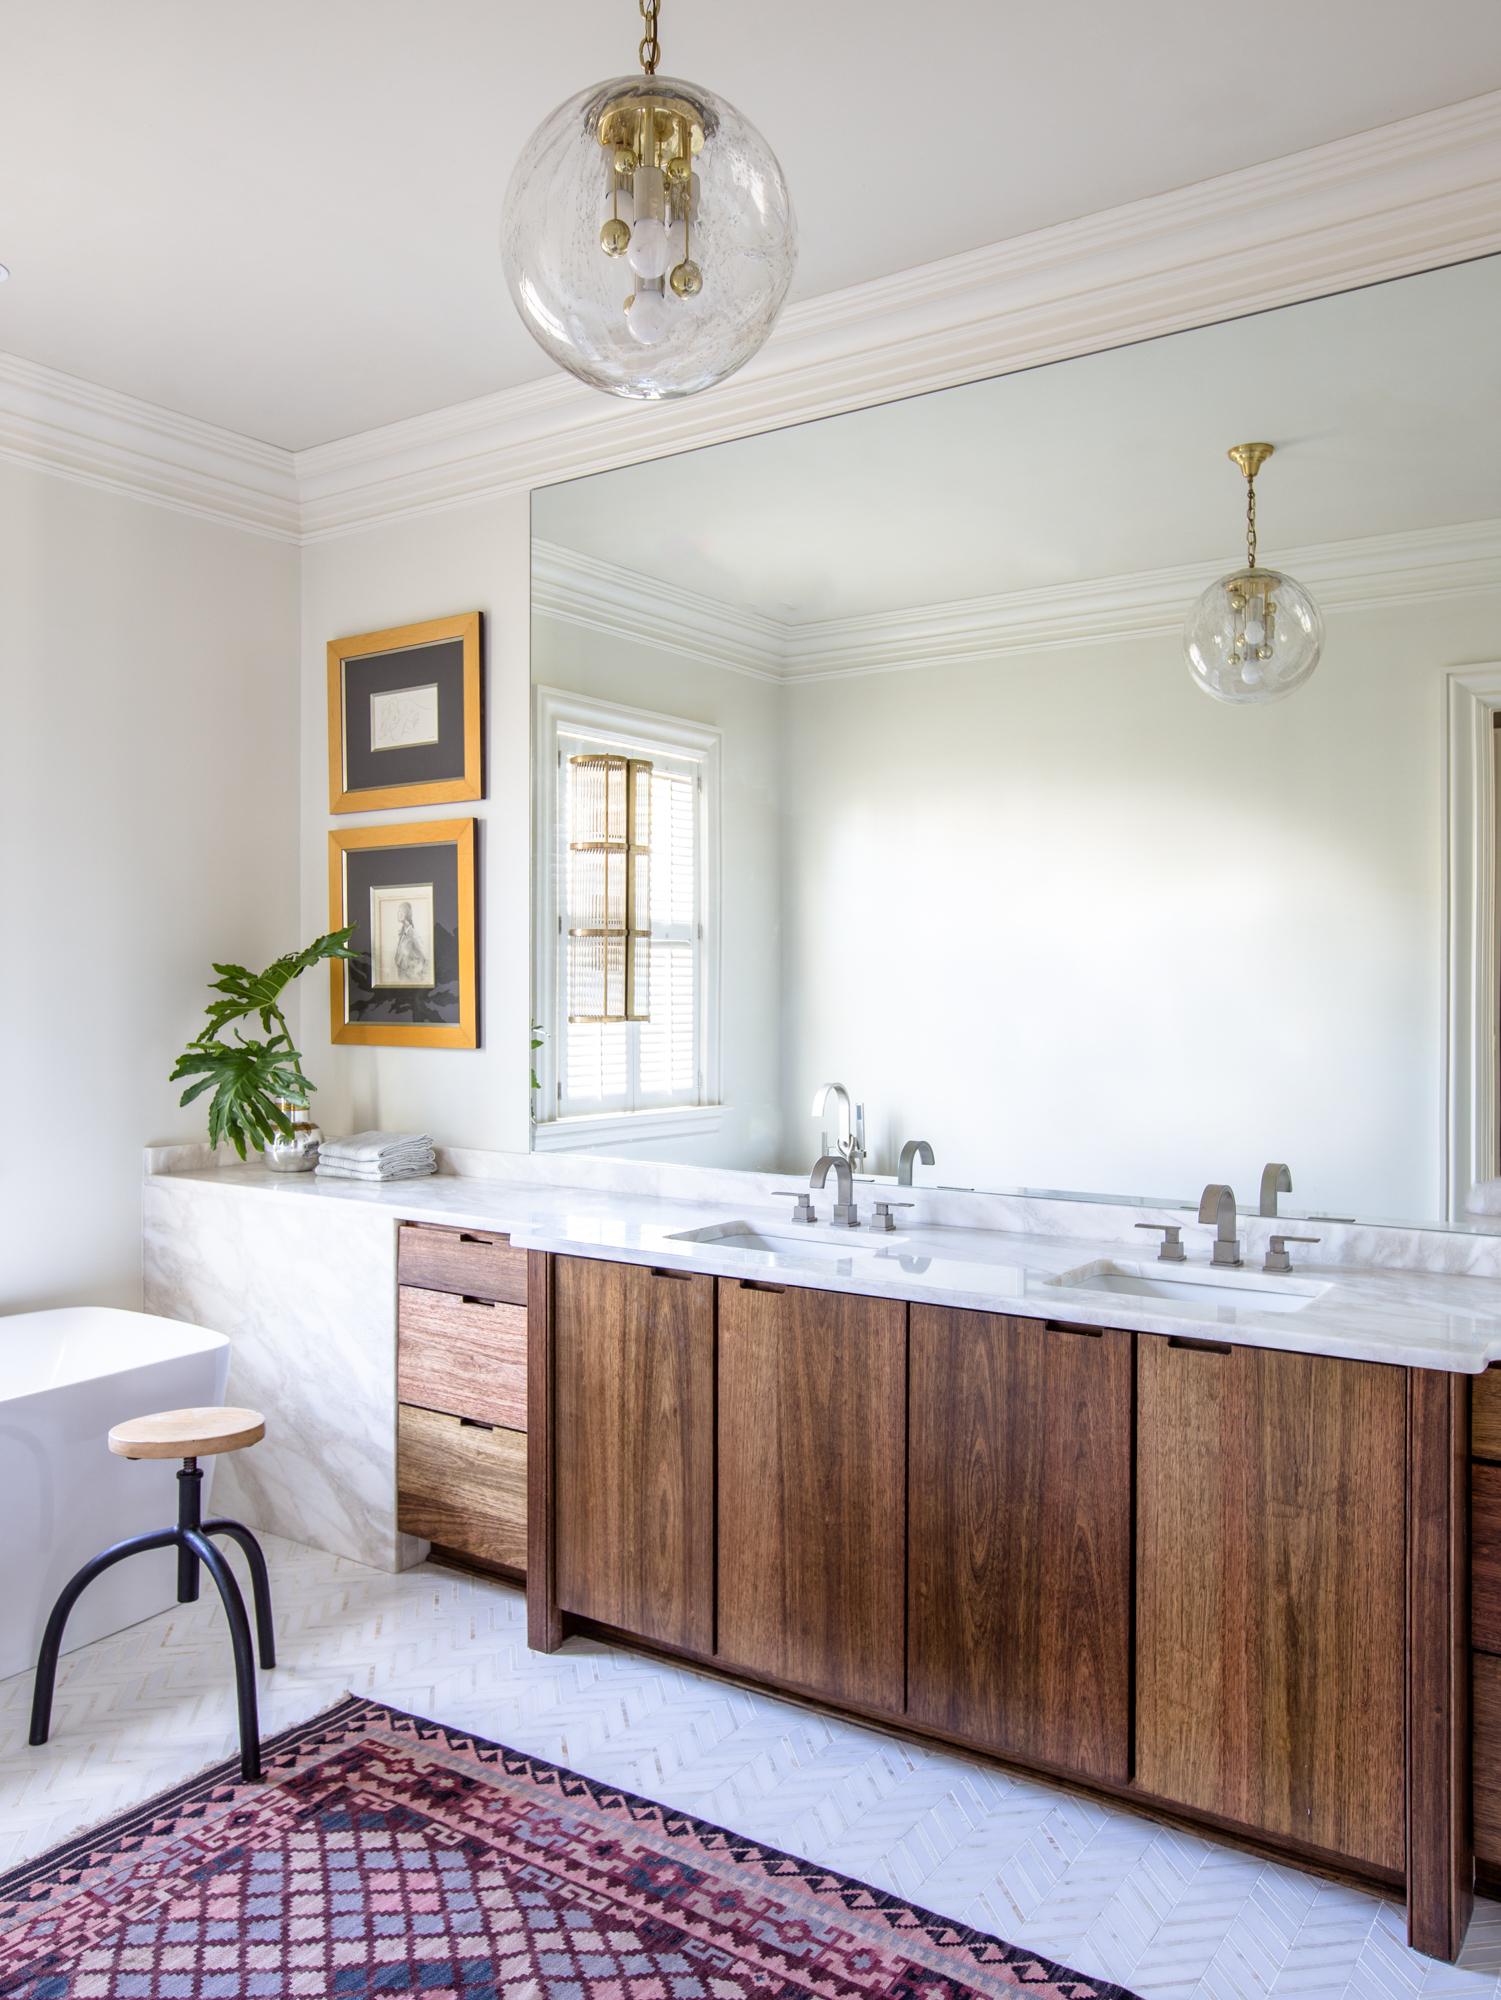 Uptown Master Bathroom by Logan Killen Interiors